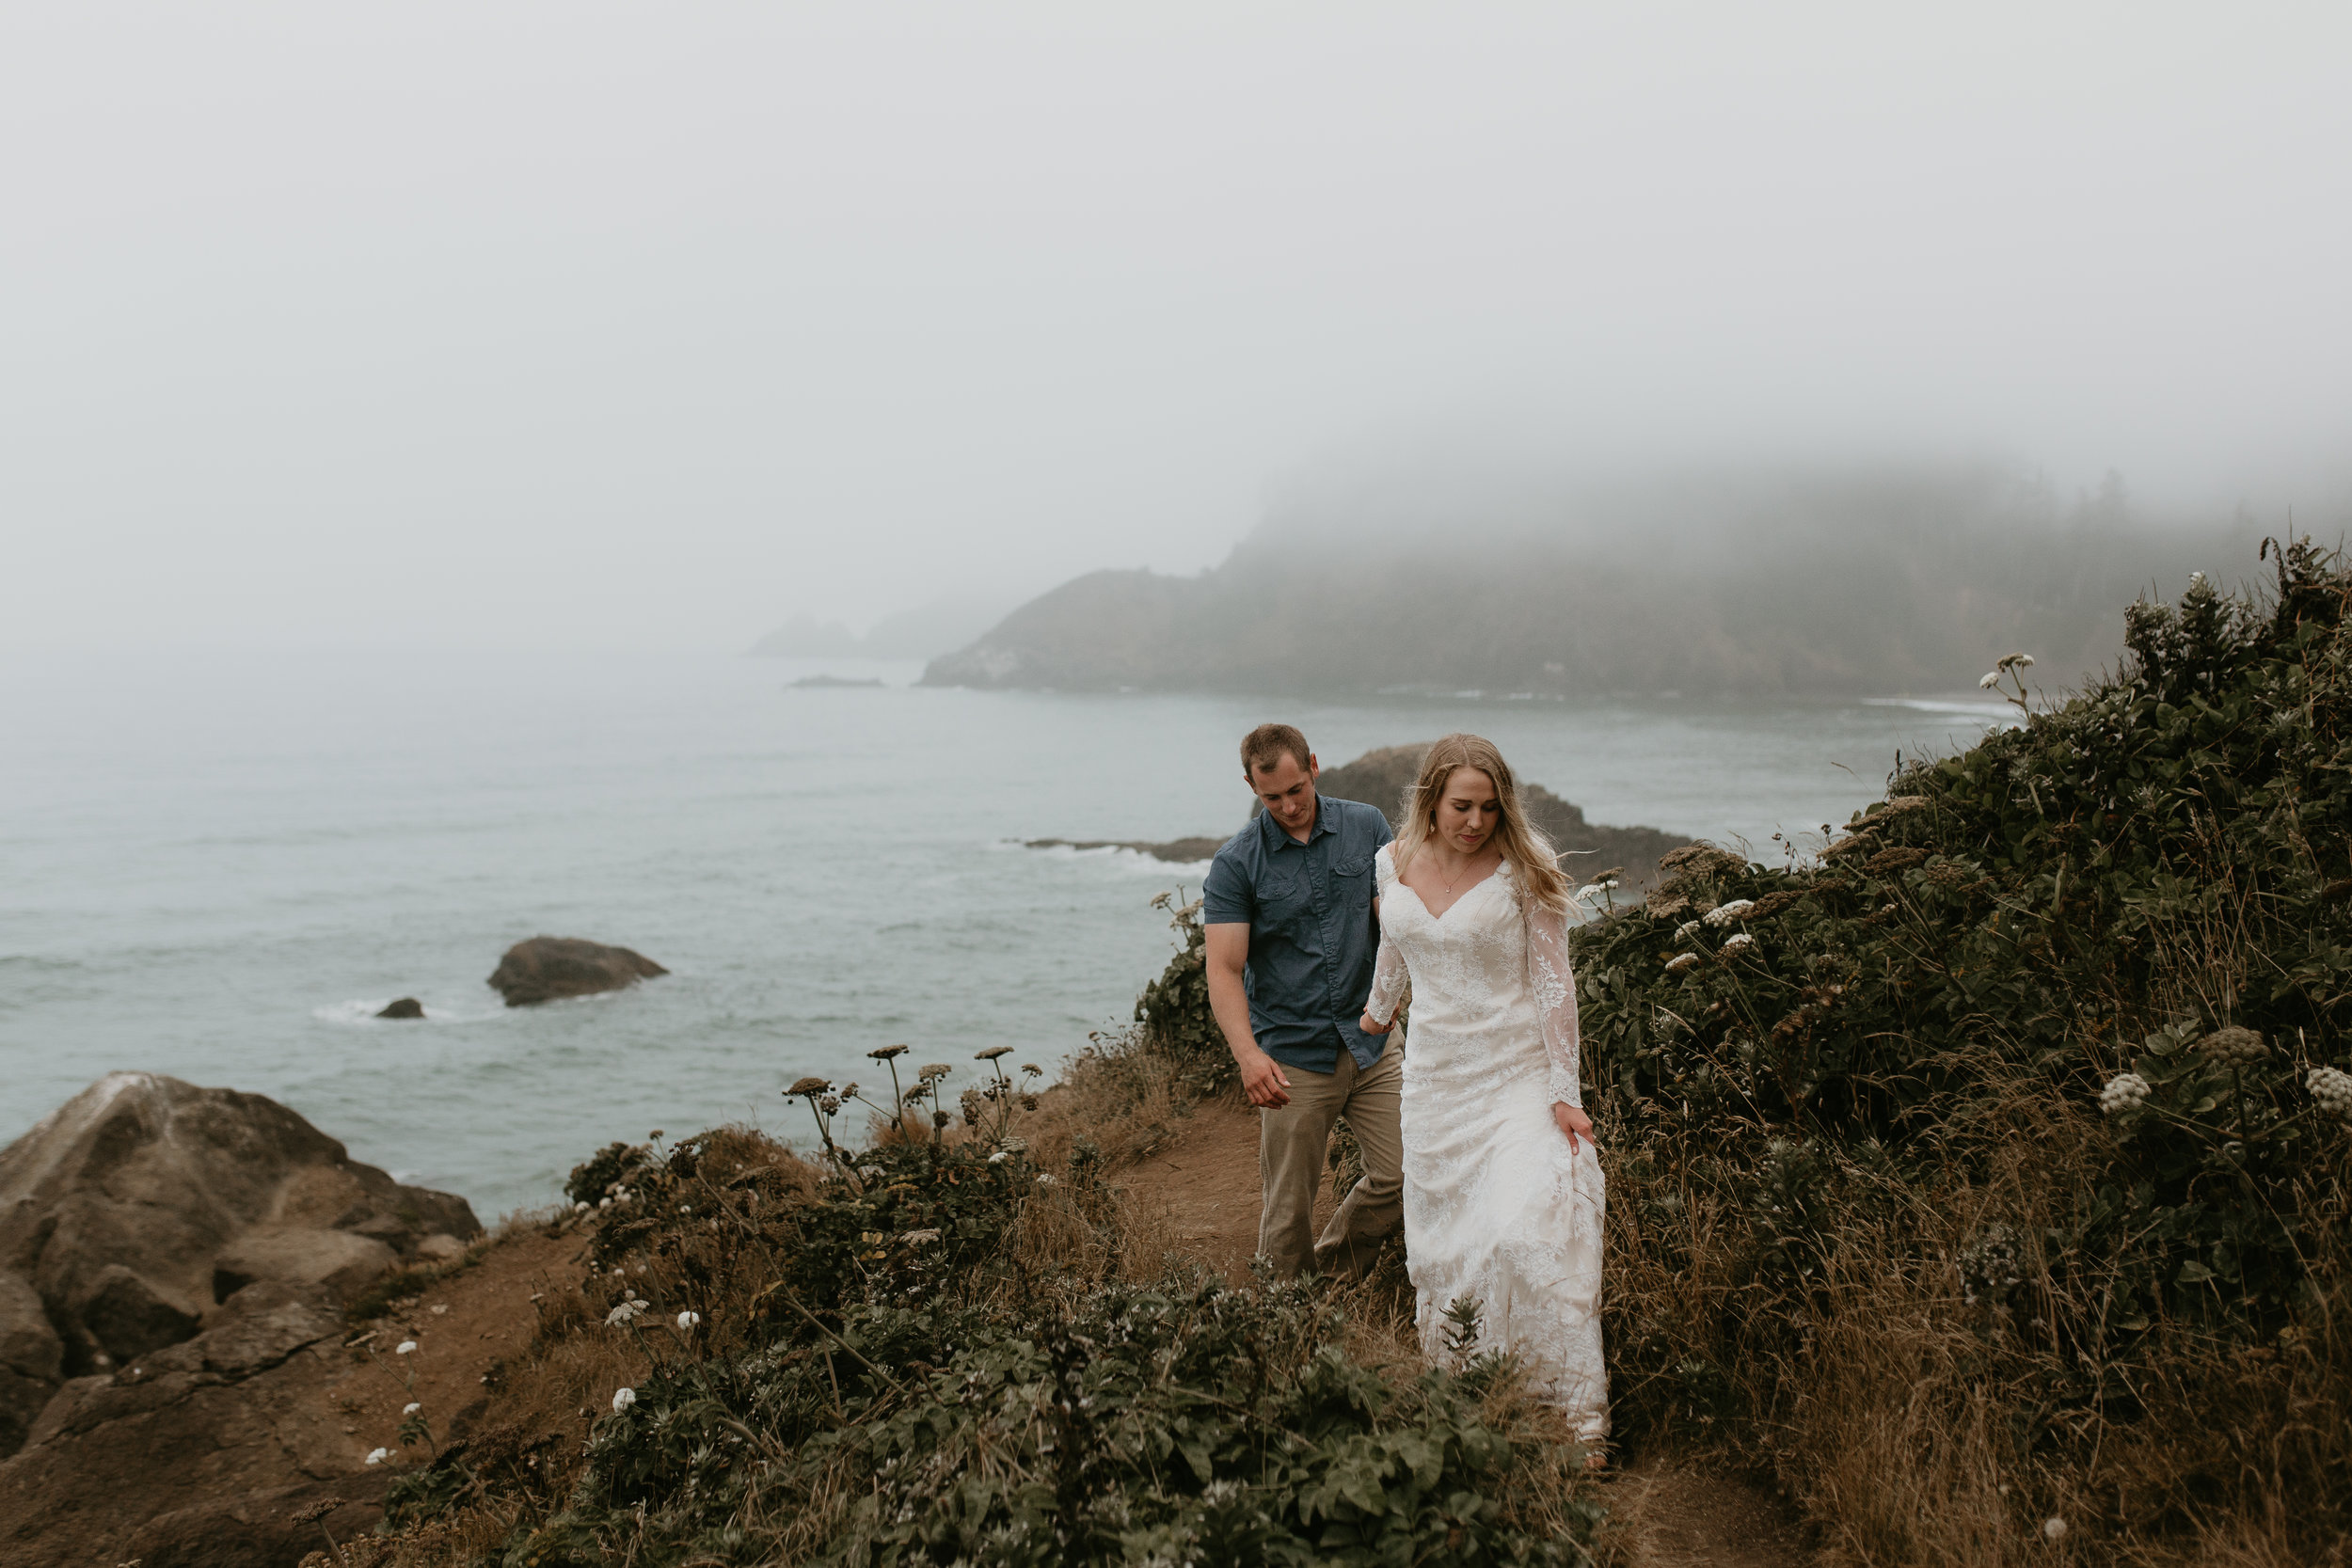 nicole-daacke-photography-ecola-state-park-oregon-elopement-bridal-photos-photographer-for-cannon-beach-elopement-oregon-coast-elopement-photographer-foggy-summer-elopement-cannon-beach-best-adventure-elopement-photographer-6978.jpg